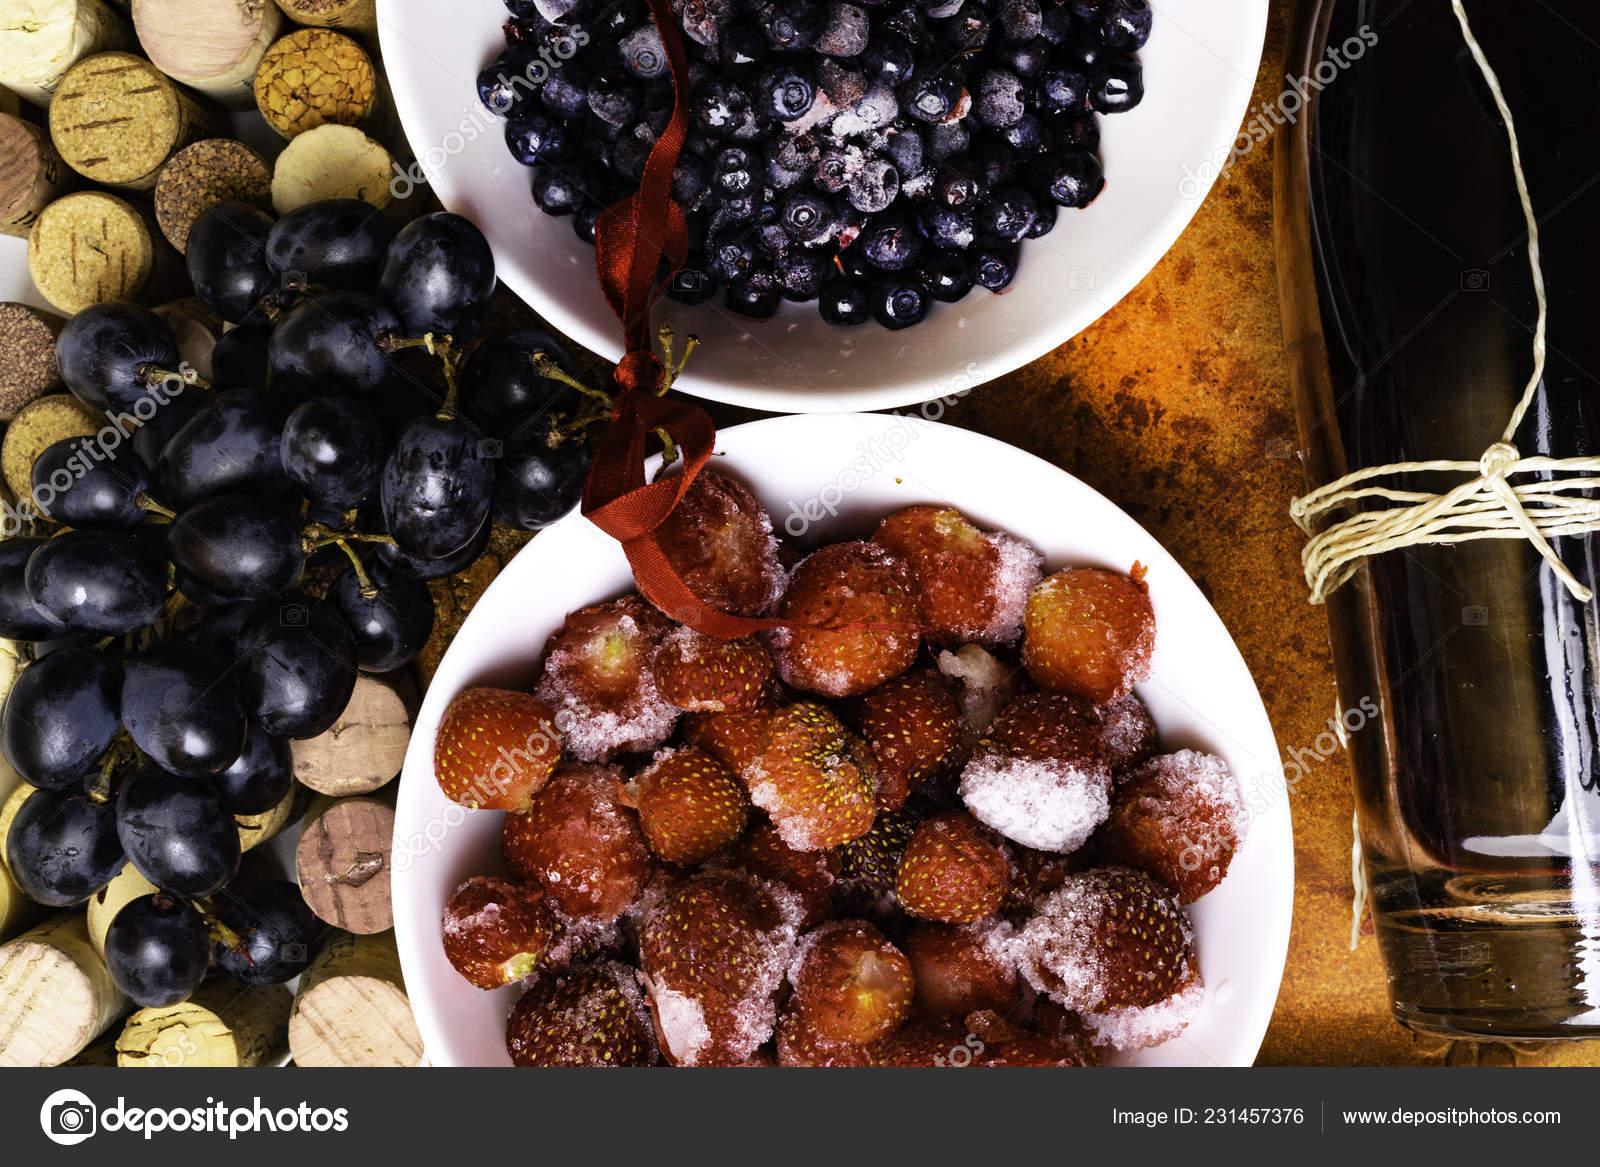 Strawberry Blueberry Grapes Wine Corks Red Wine Antioxidants Resveratrol Flavonoids Stock Photo C Dian4ikn Gmail Com 231457376